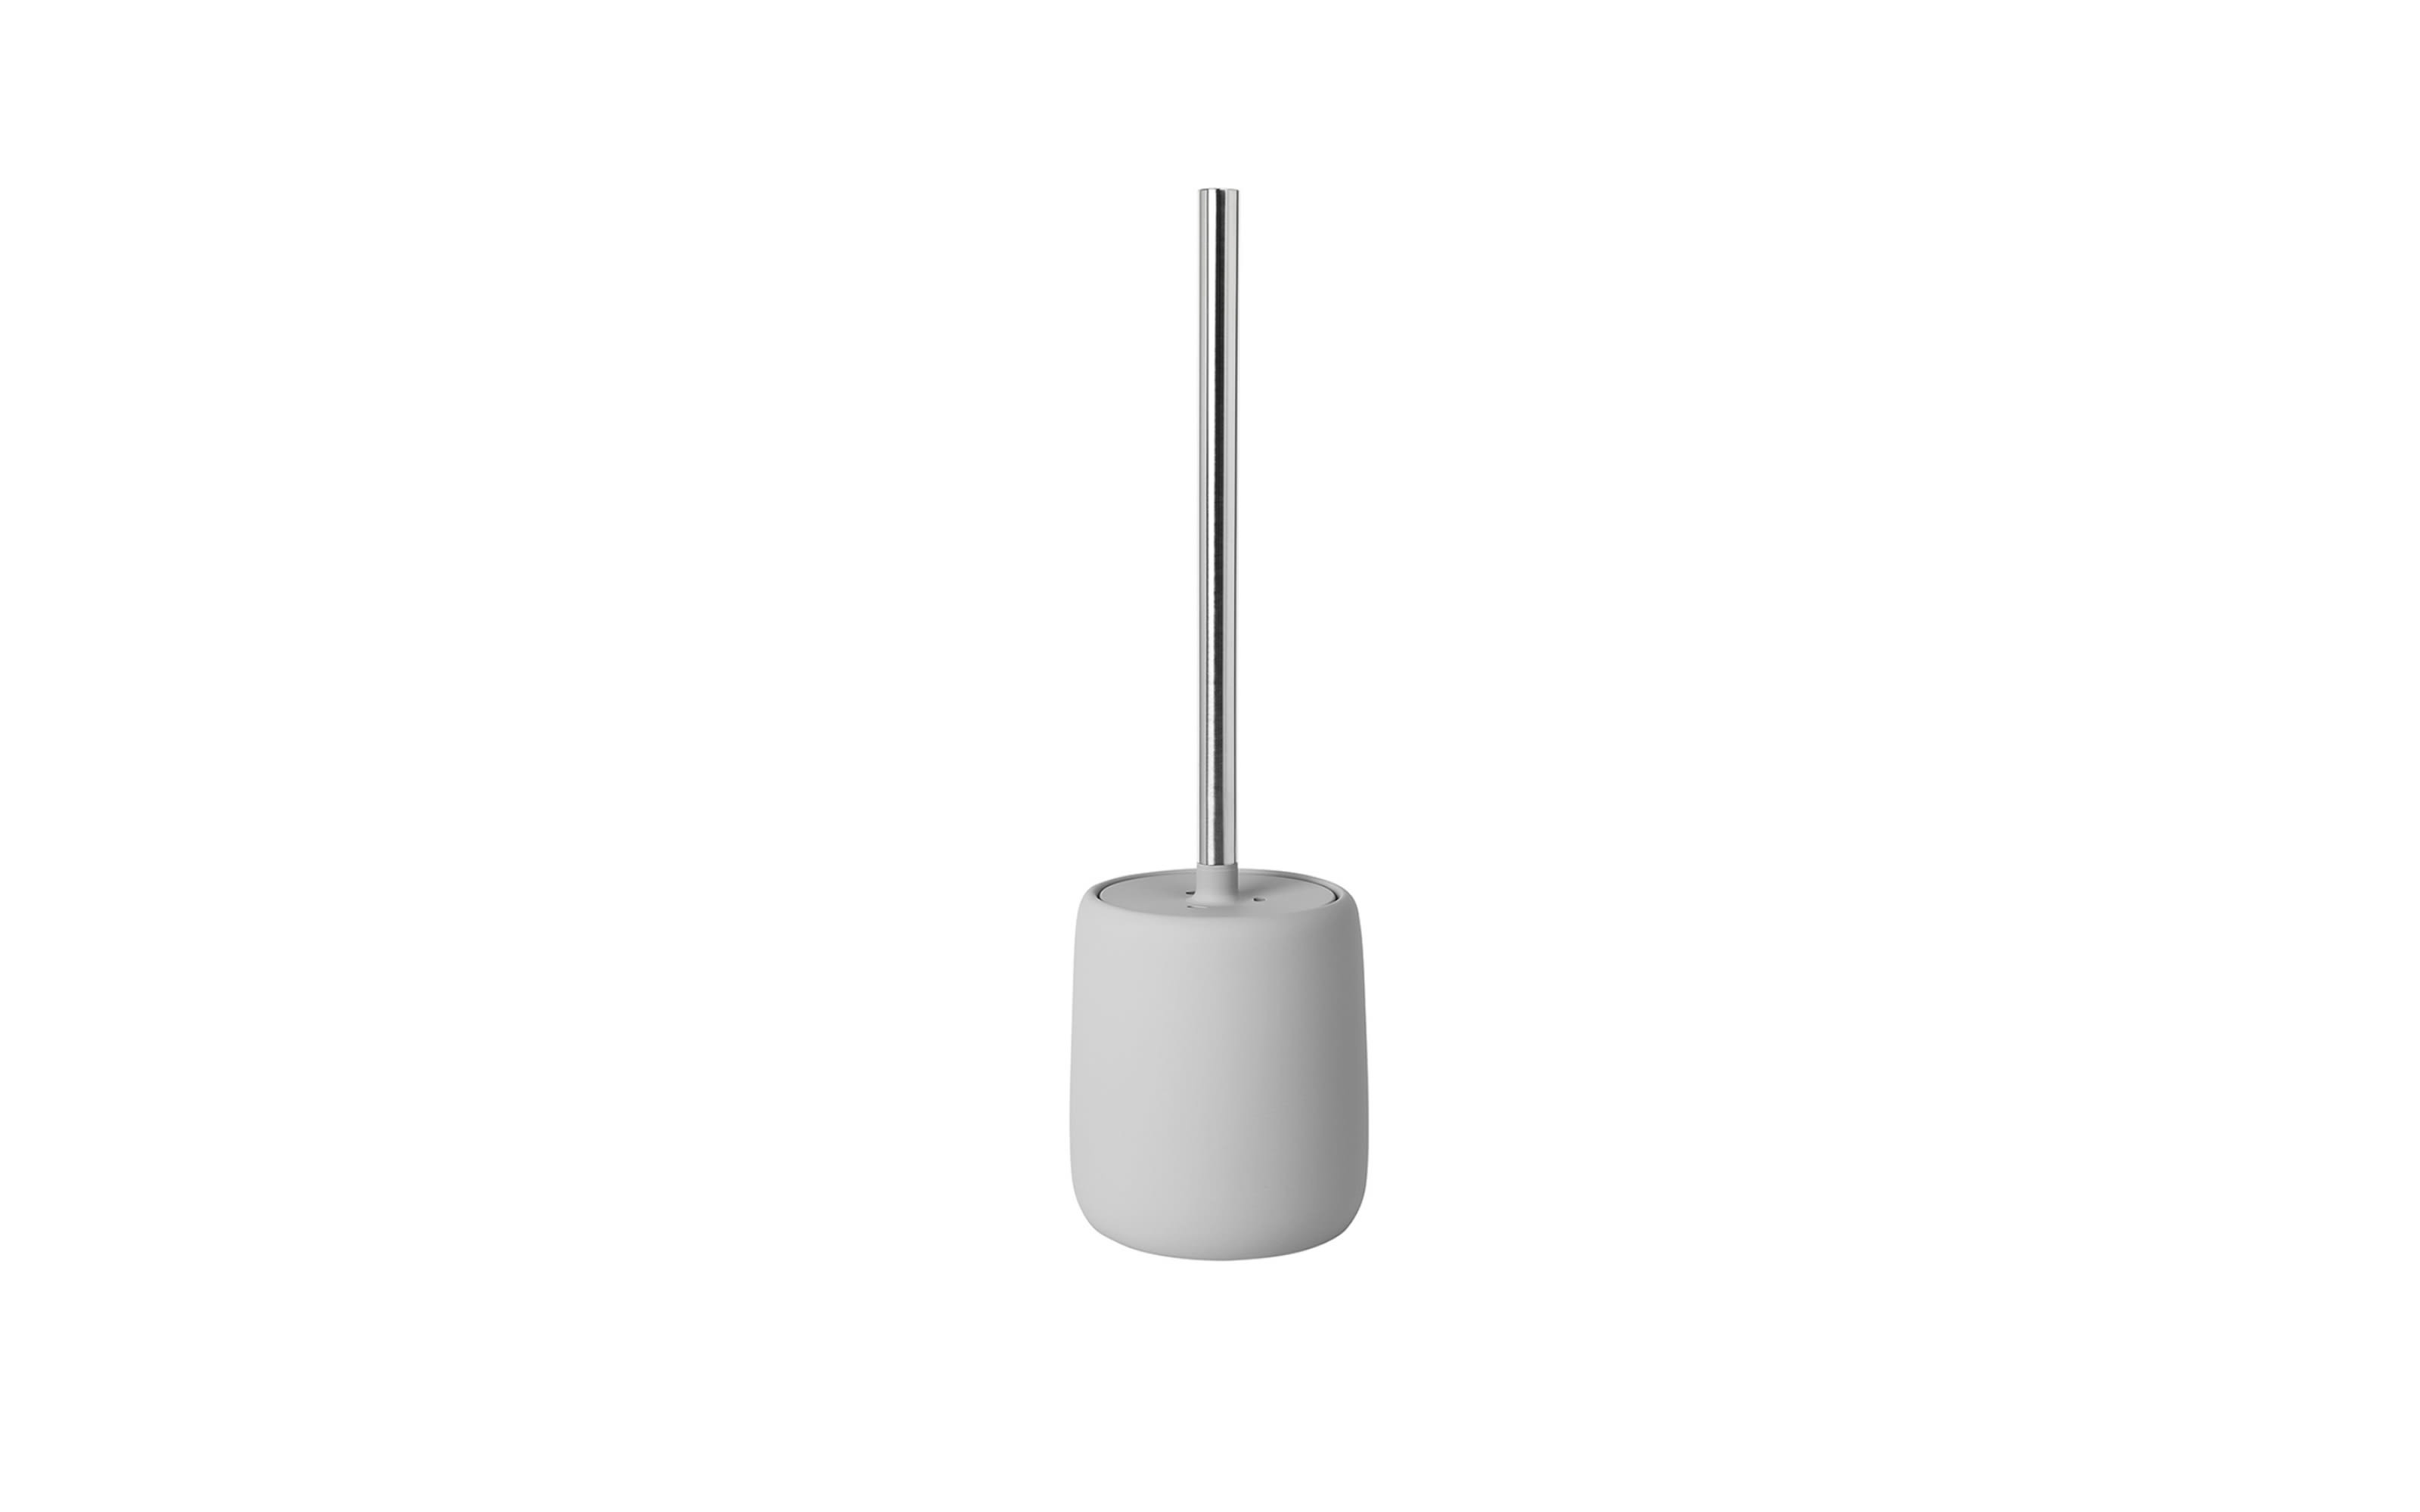 WC-Bürste Sono in micro chip, 11 cm